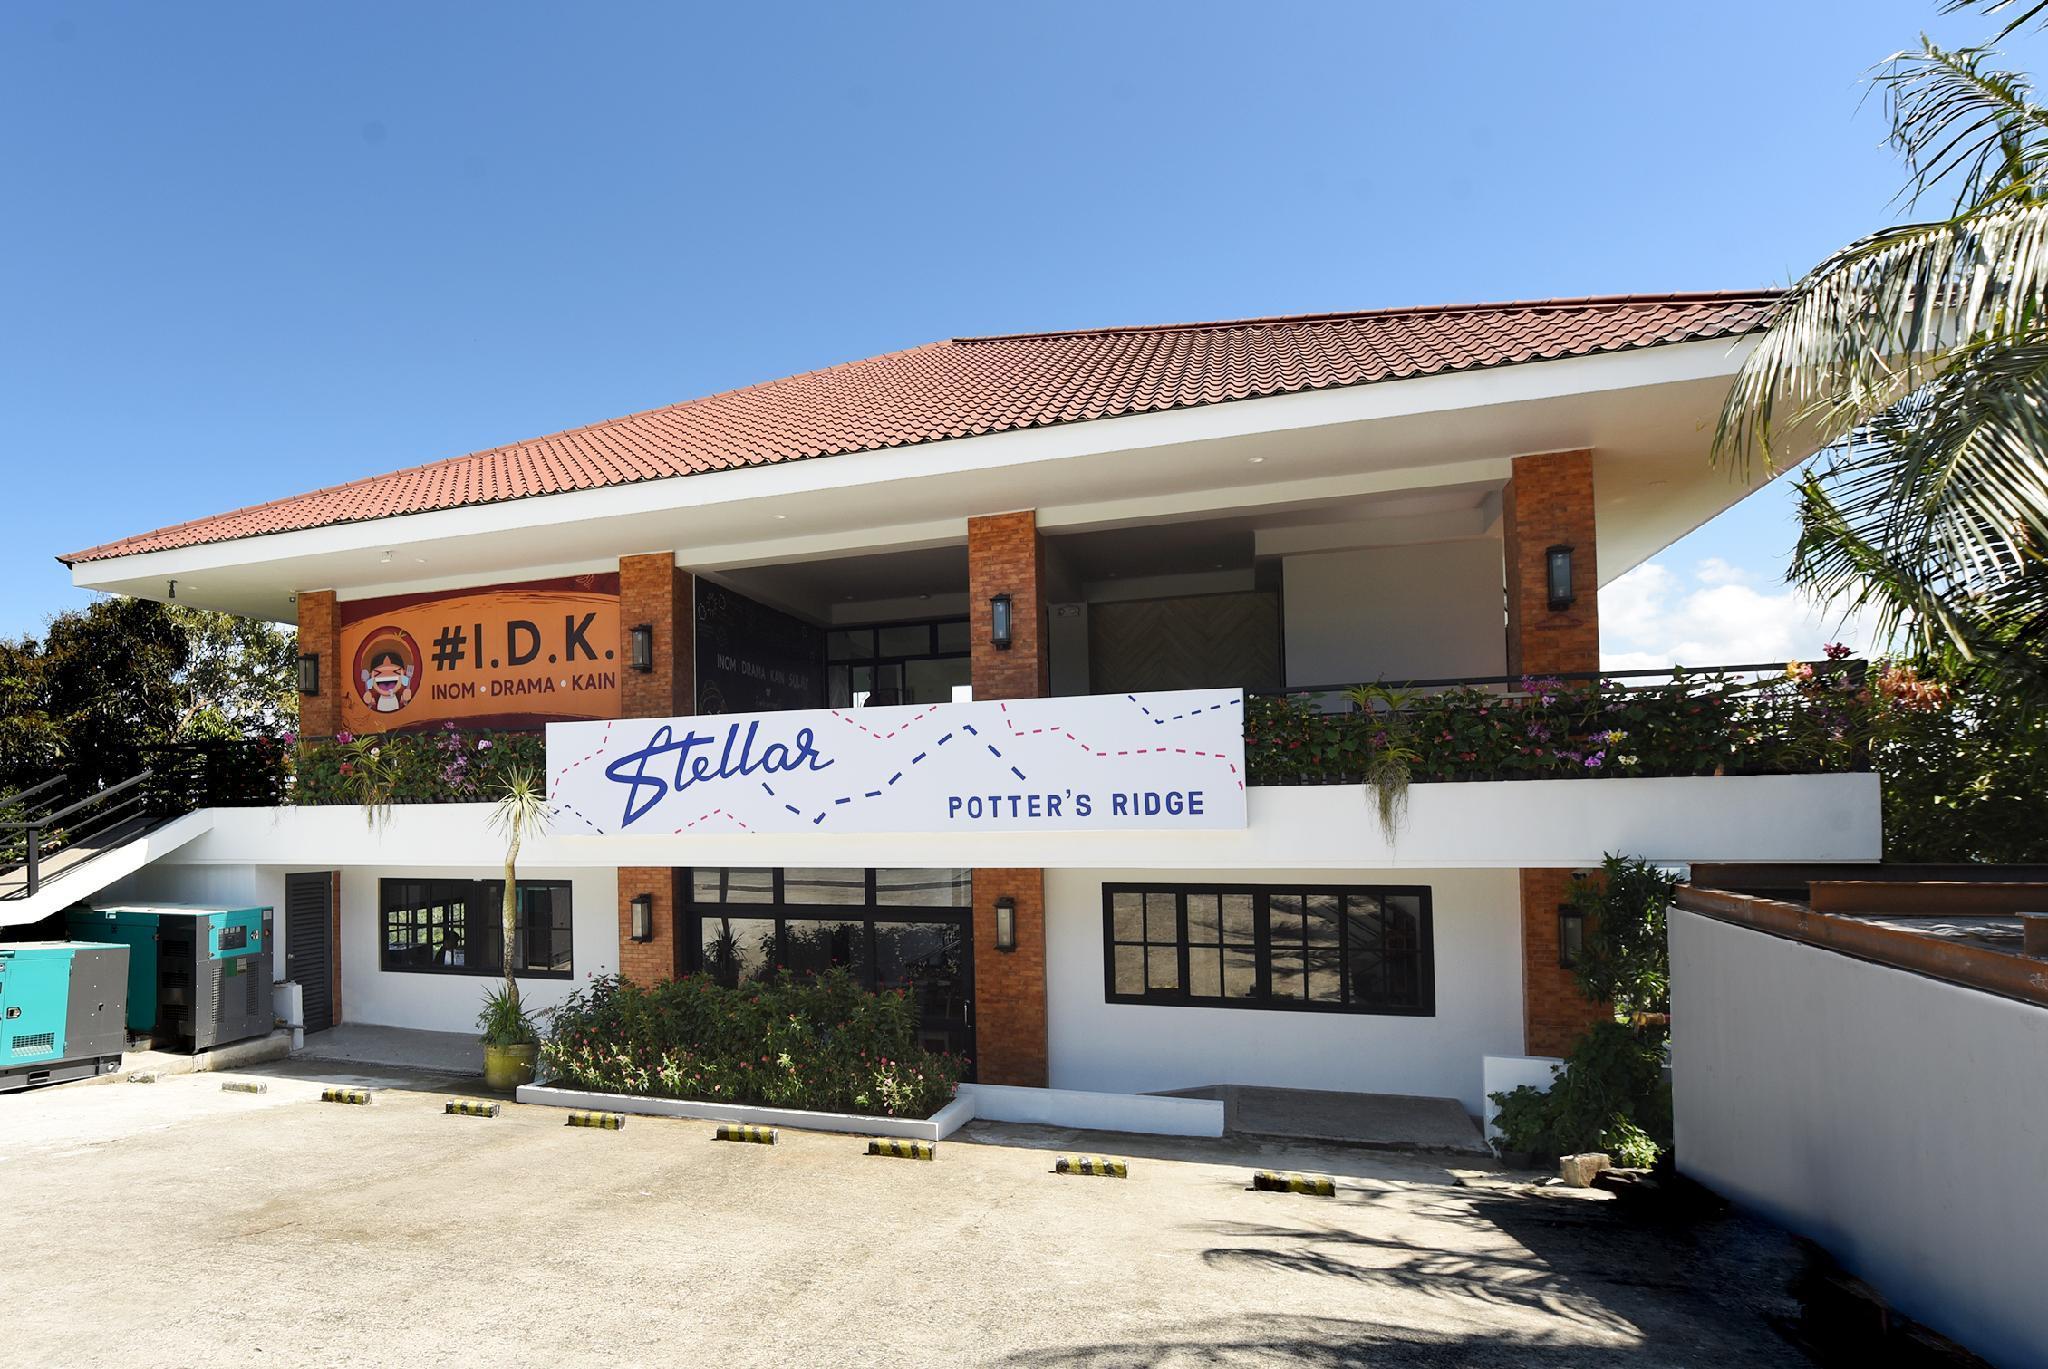 Stellar Potter's Ridge Hotel Tagaytay